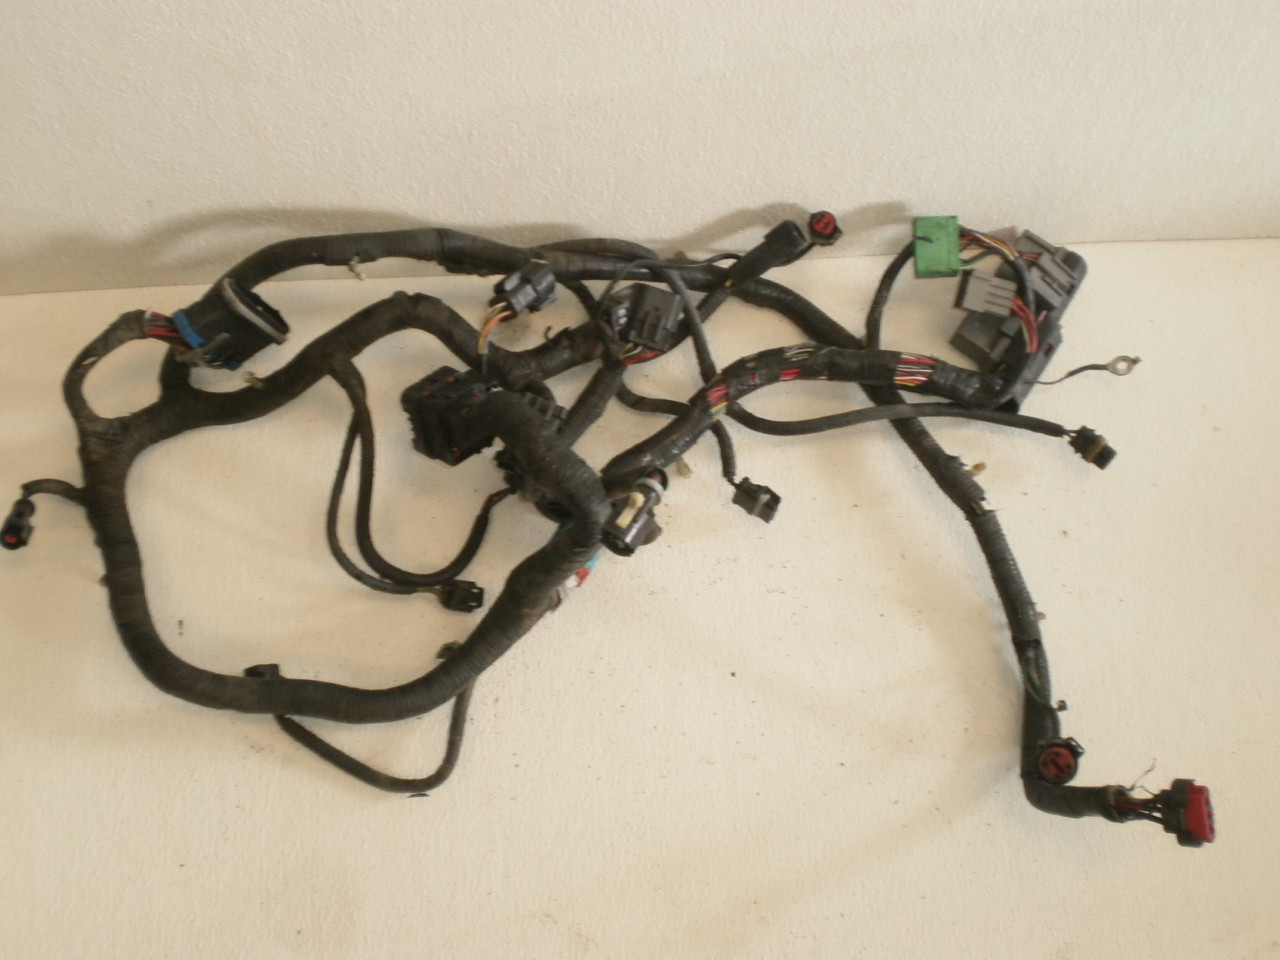 medium resolution of 2001 mustang wiring harness wiring diagram inside 2001 ford mustang radio wiring harness 2001 mustang wiring harness